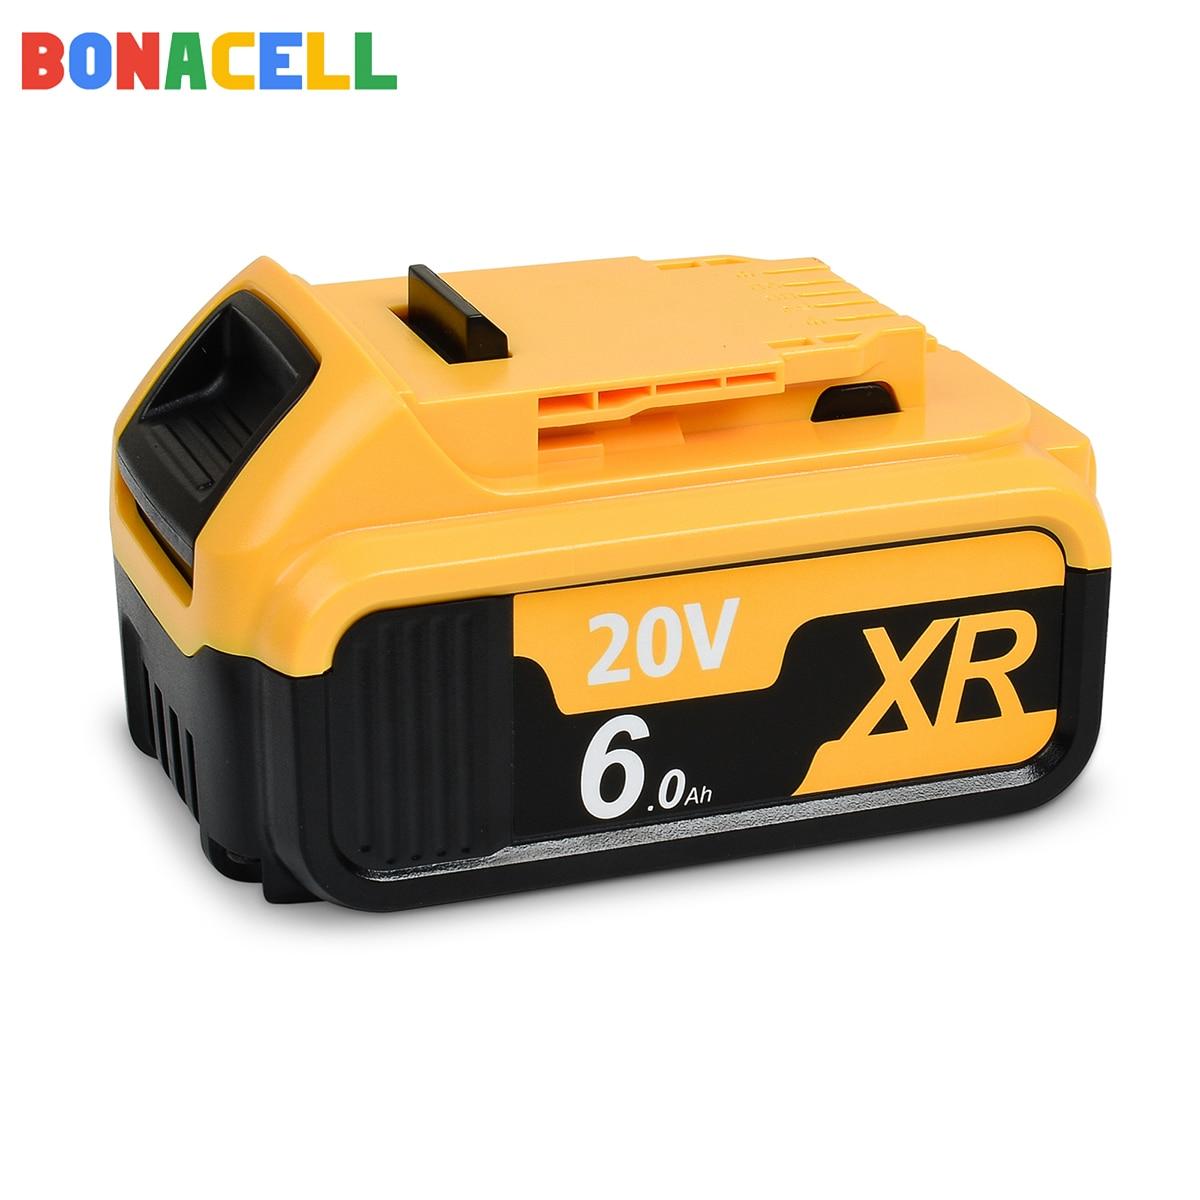 Bonacell 2 قطعة 18/20V 6.0Ah ليثيوم أيون DCB200 بطارية ل ديوالت ماكس XR الطاقة أدوات DCB184 DCB201 DCB203 DCB204 DCB205 DCB206 DCB207